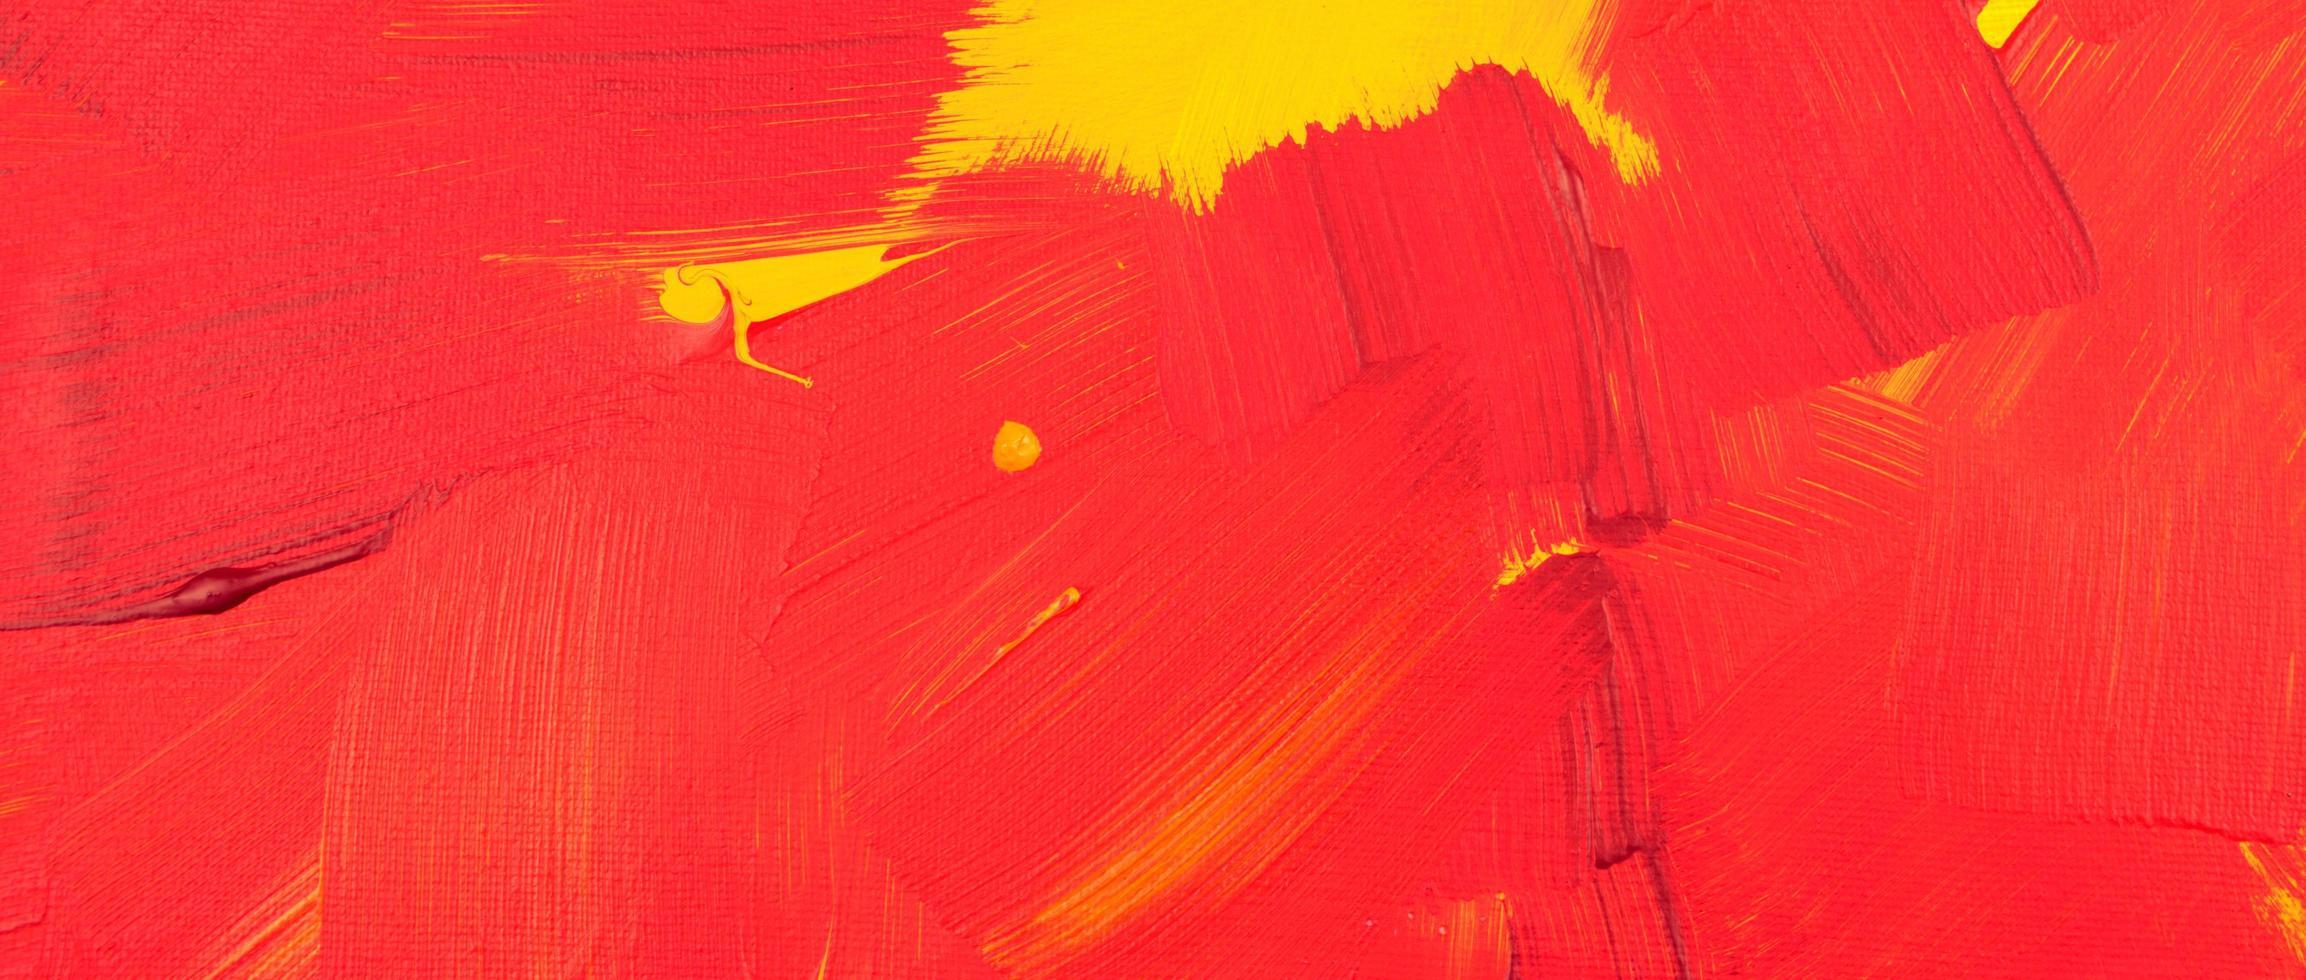 Fondo de pintura abstracta hecha a mano, dibujada a mano foto